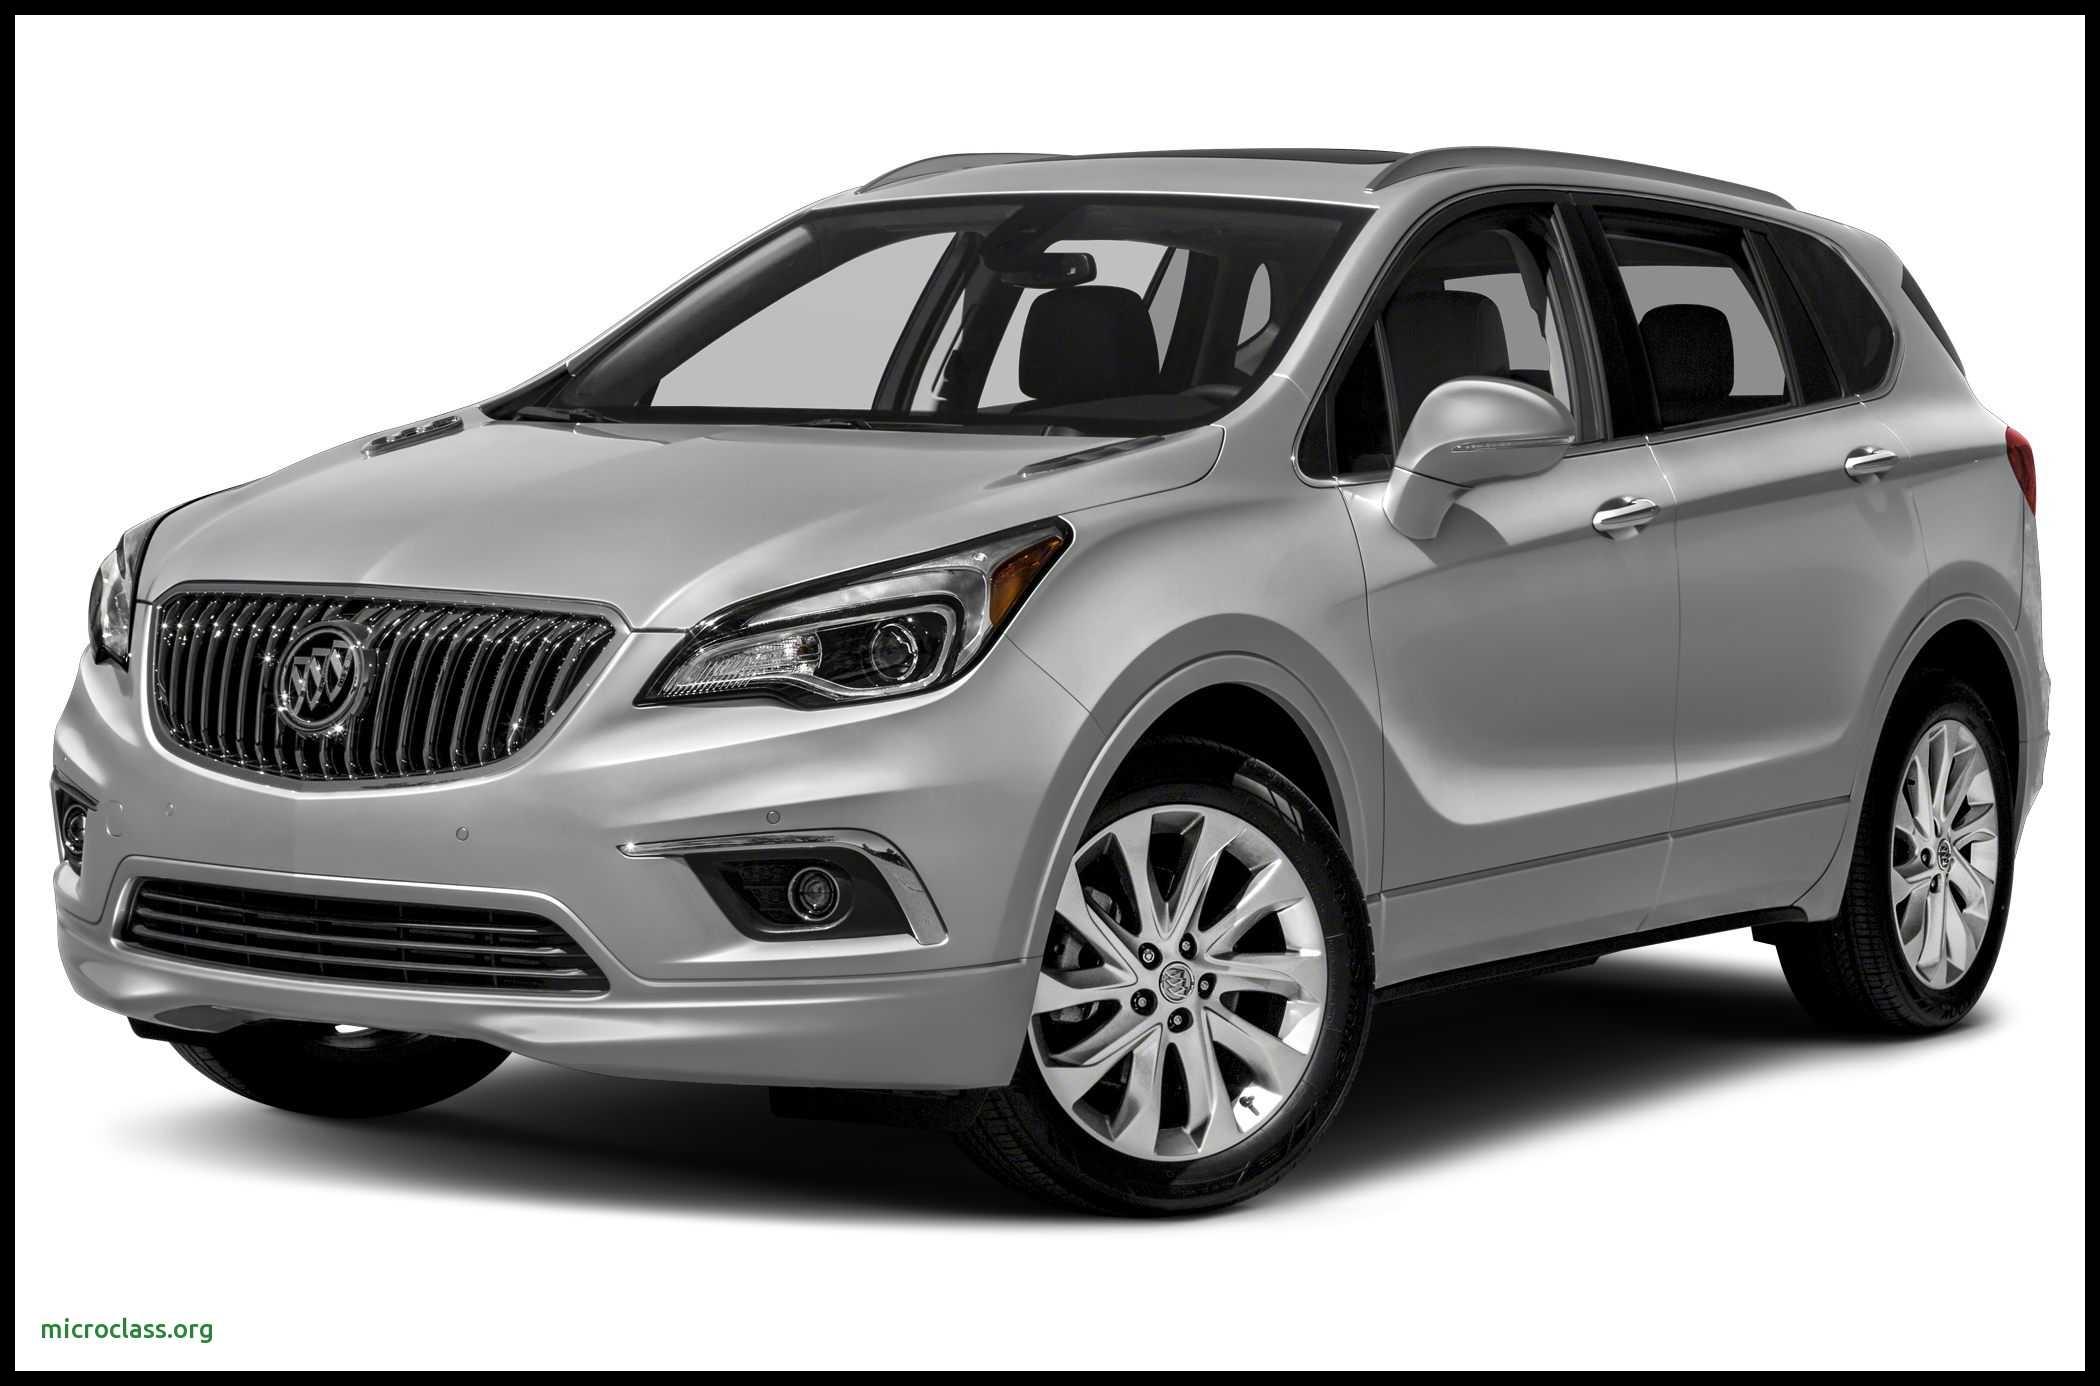 2018 Buick Envision Vs 2018 toyota Rav4 and 2018 Hyundai Santa Fe Lovely toyota Rav4